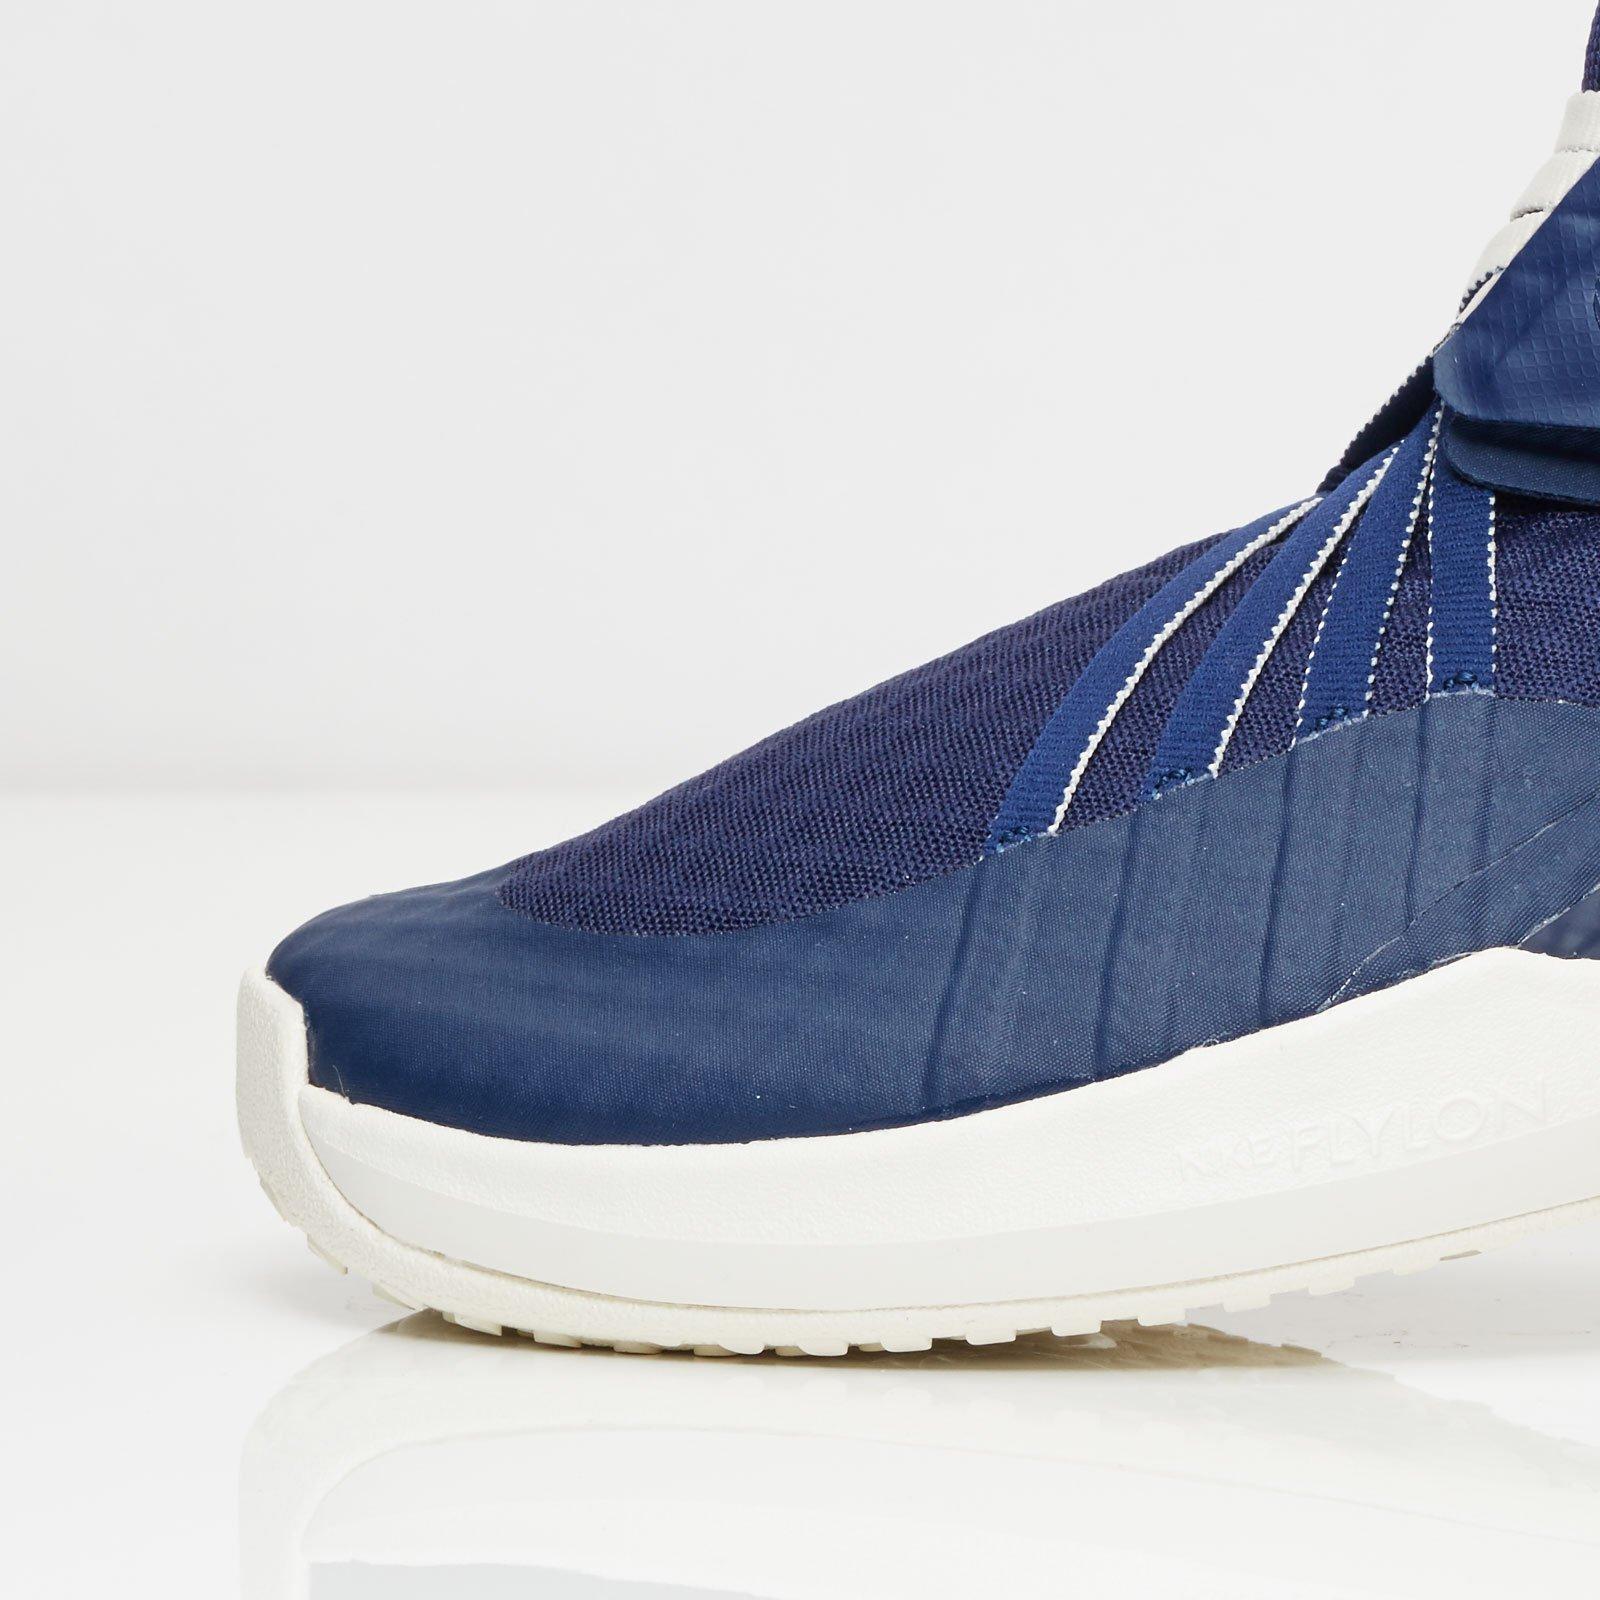 4ac9a7a10758 Nike Flylon Train Dynamic Premium QS - 882105-400 - Sneakersnstuff ...